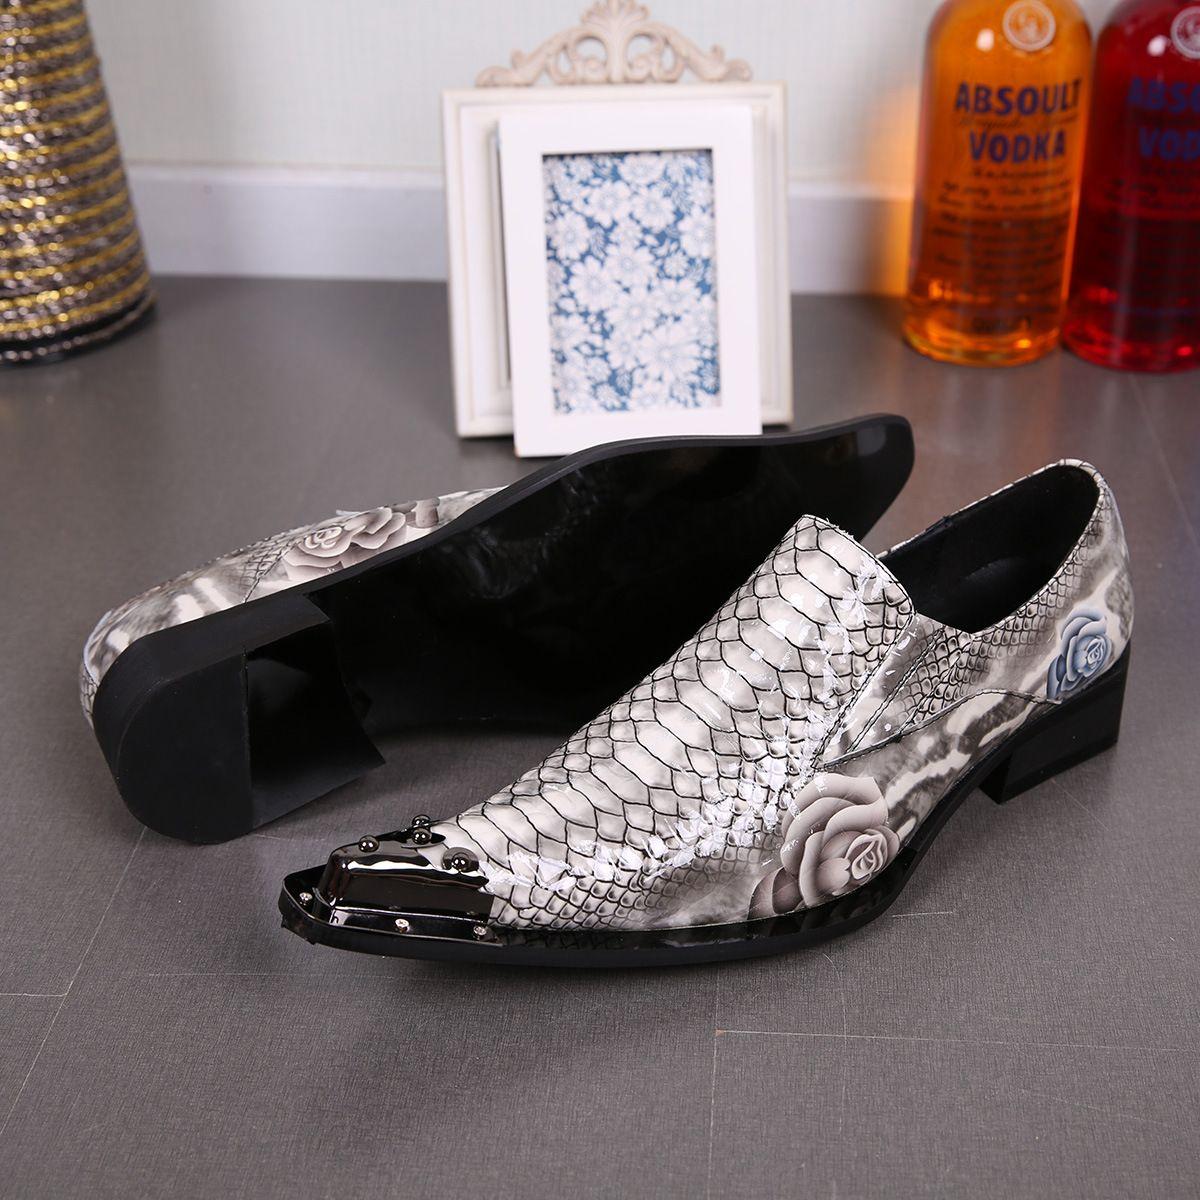 Italy leather snake skin shoes men men's slide shoe designer Sapatos Masculino groom wedding shoes party shoes